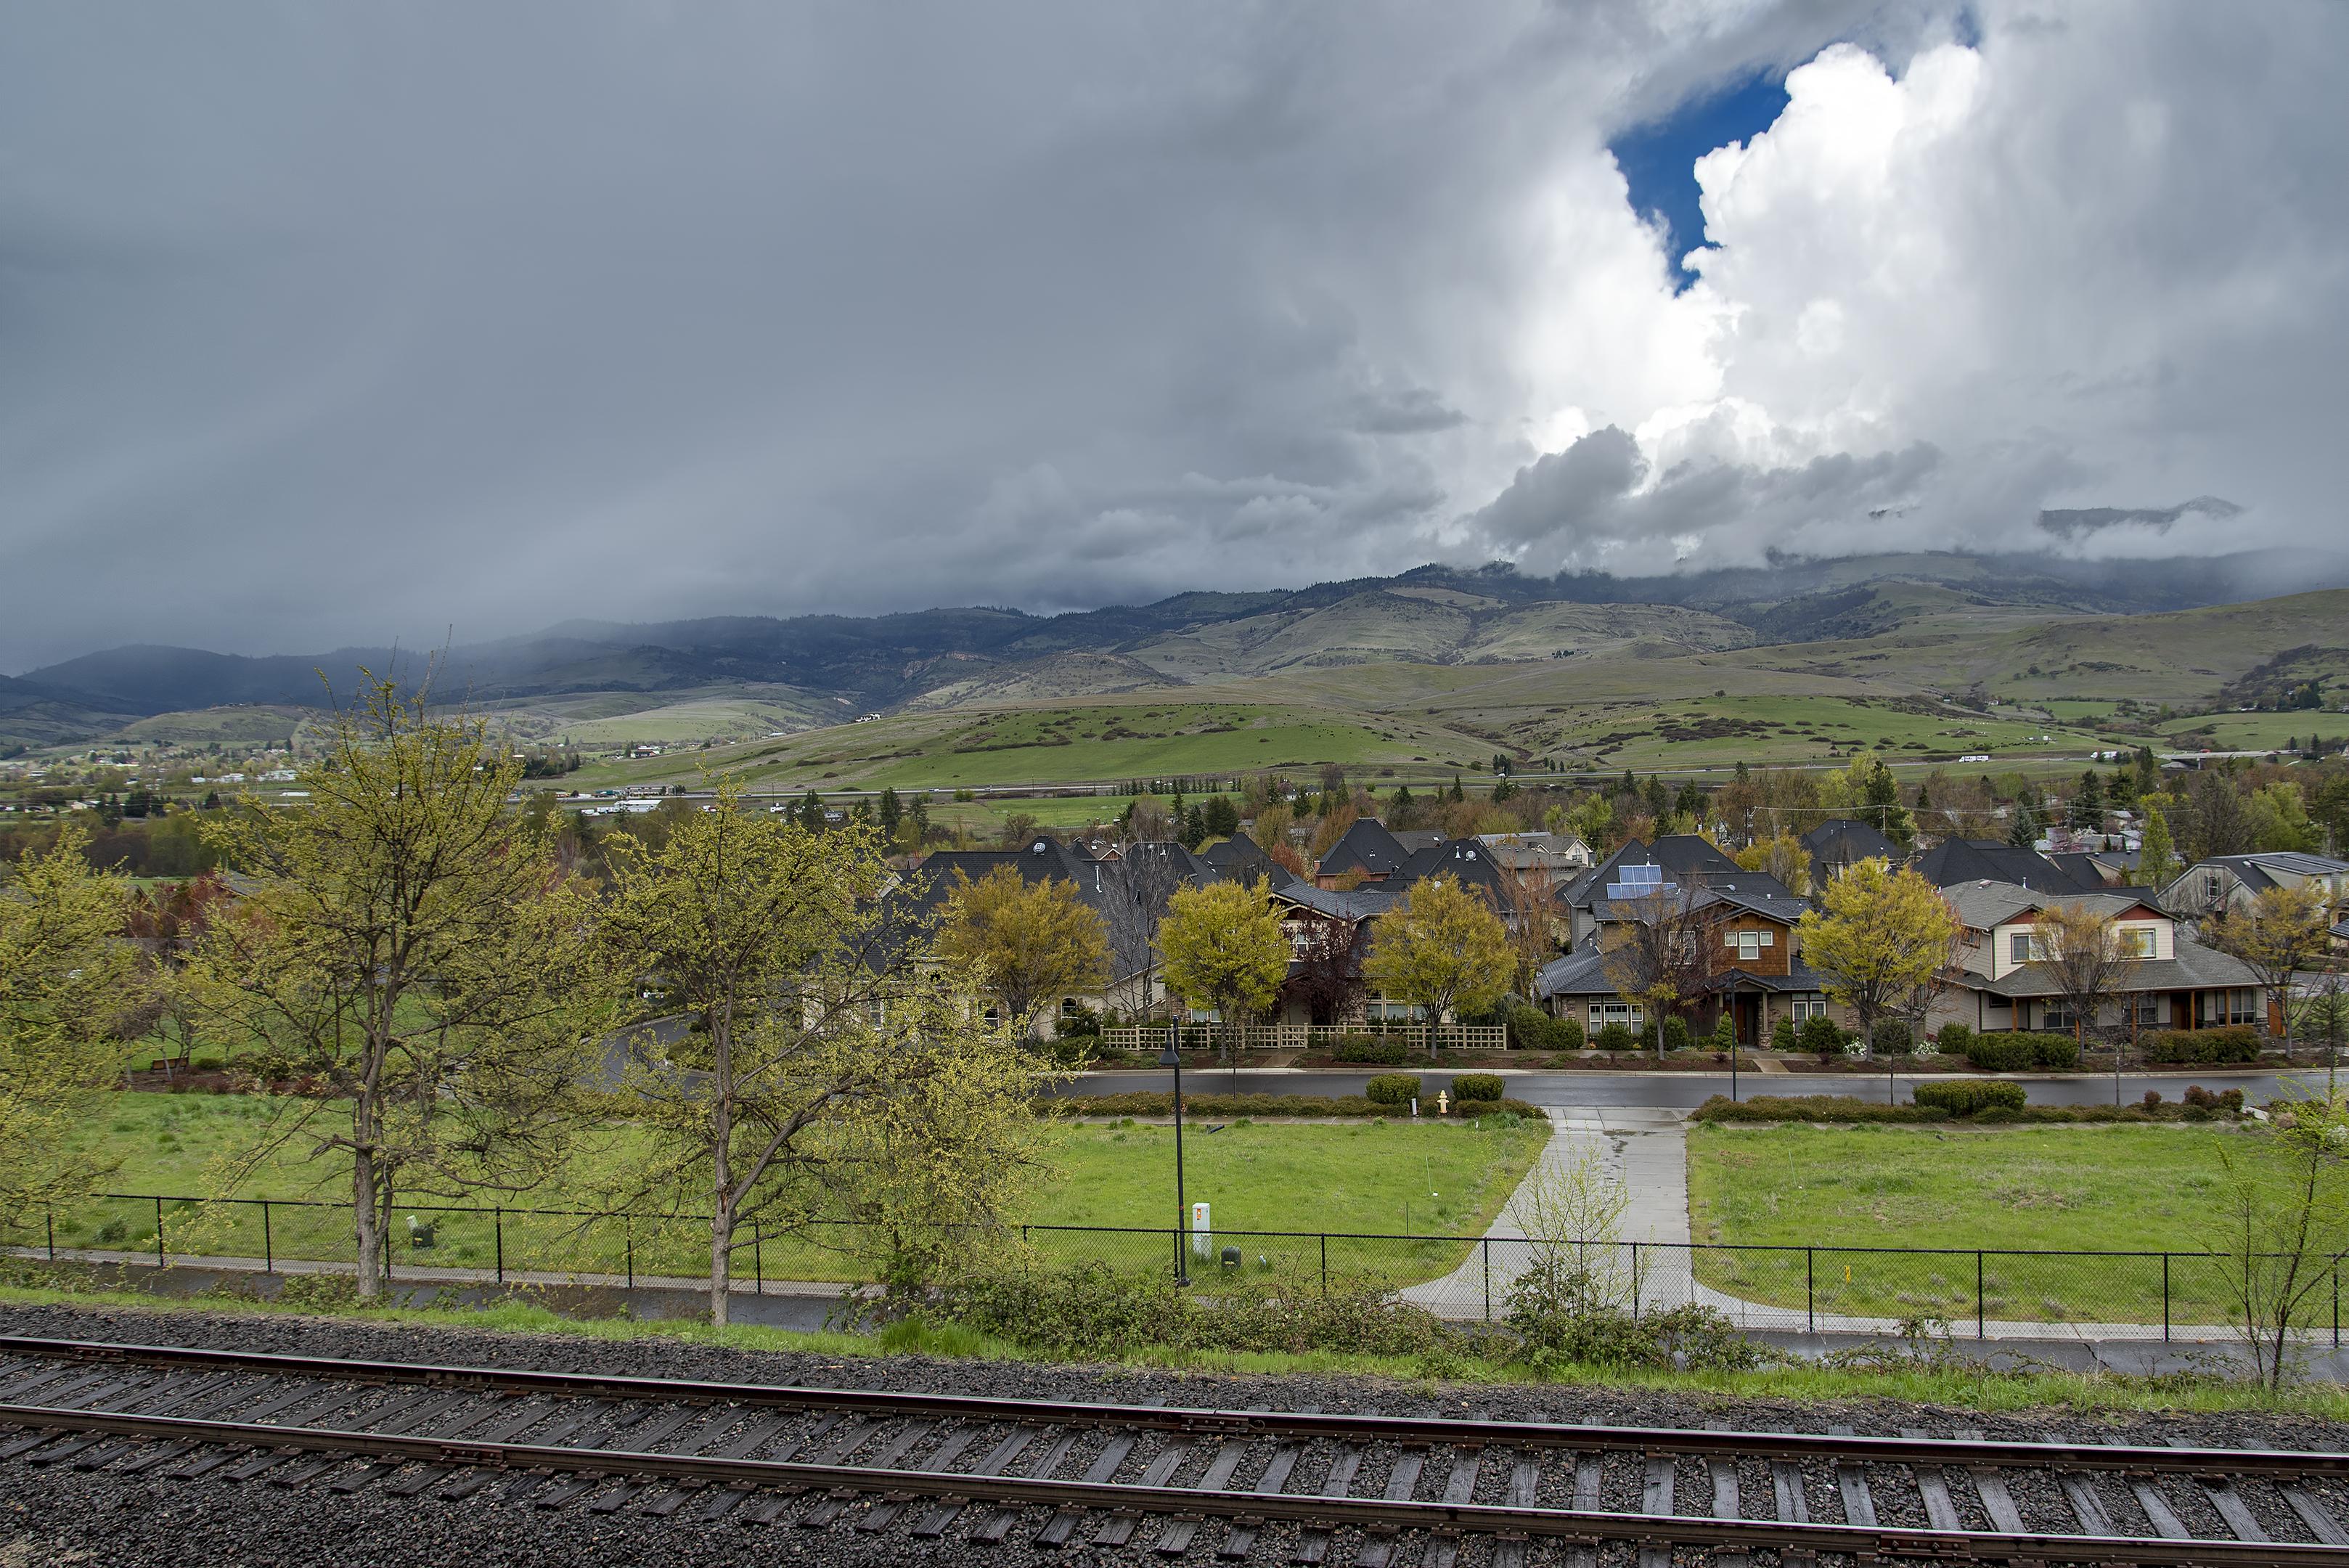 ashland railroad tracks grizzly peak clouds